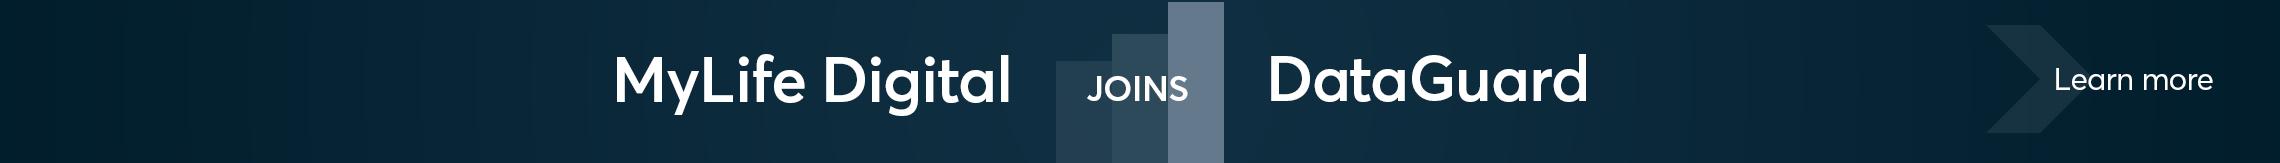 MyLifeDigital Joins DataGuard